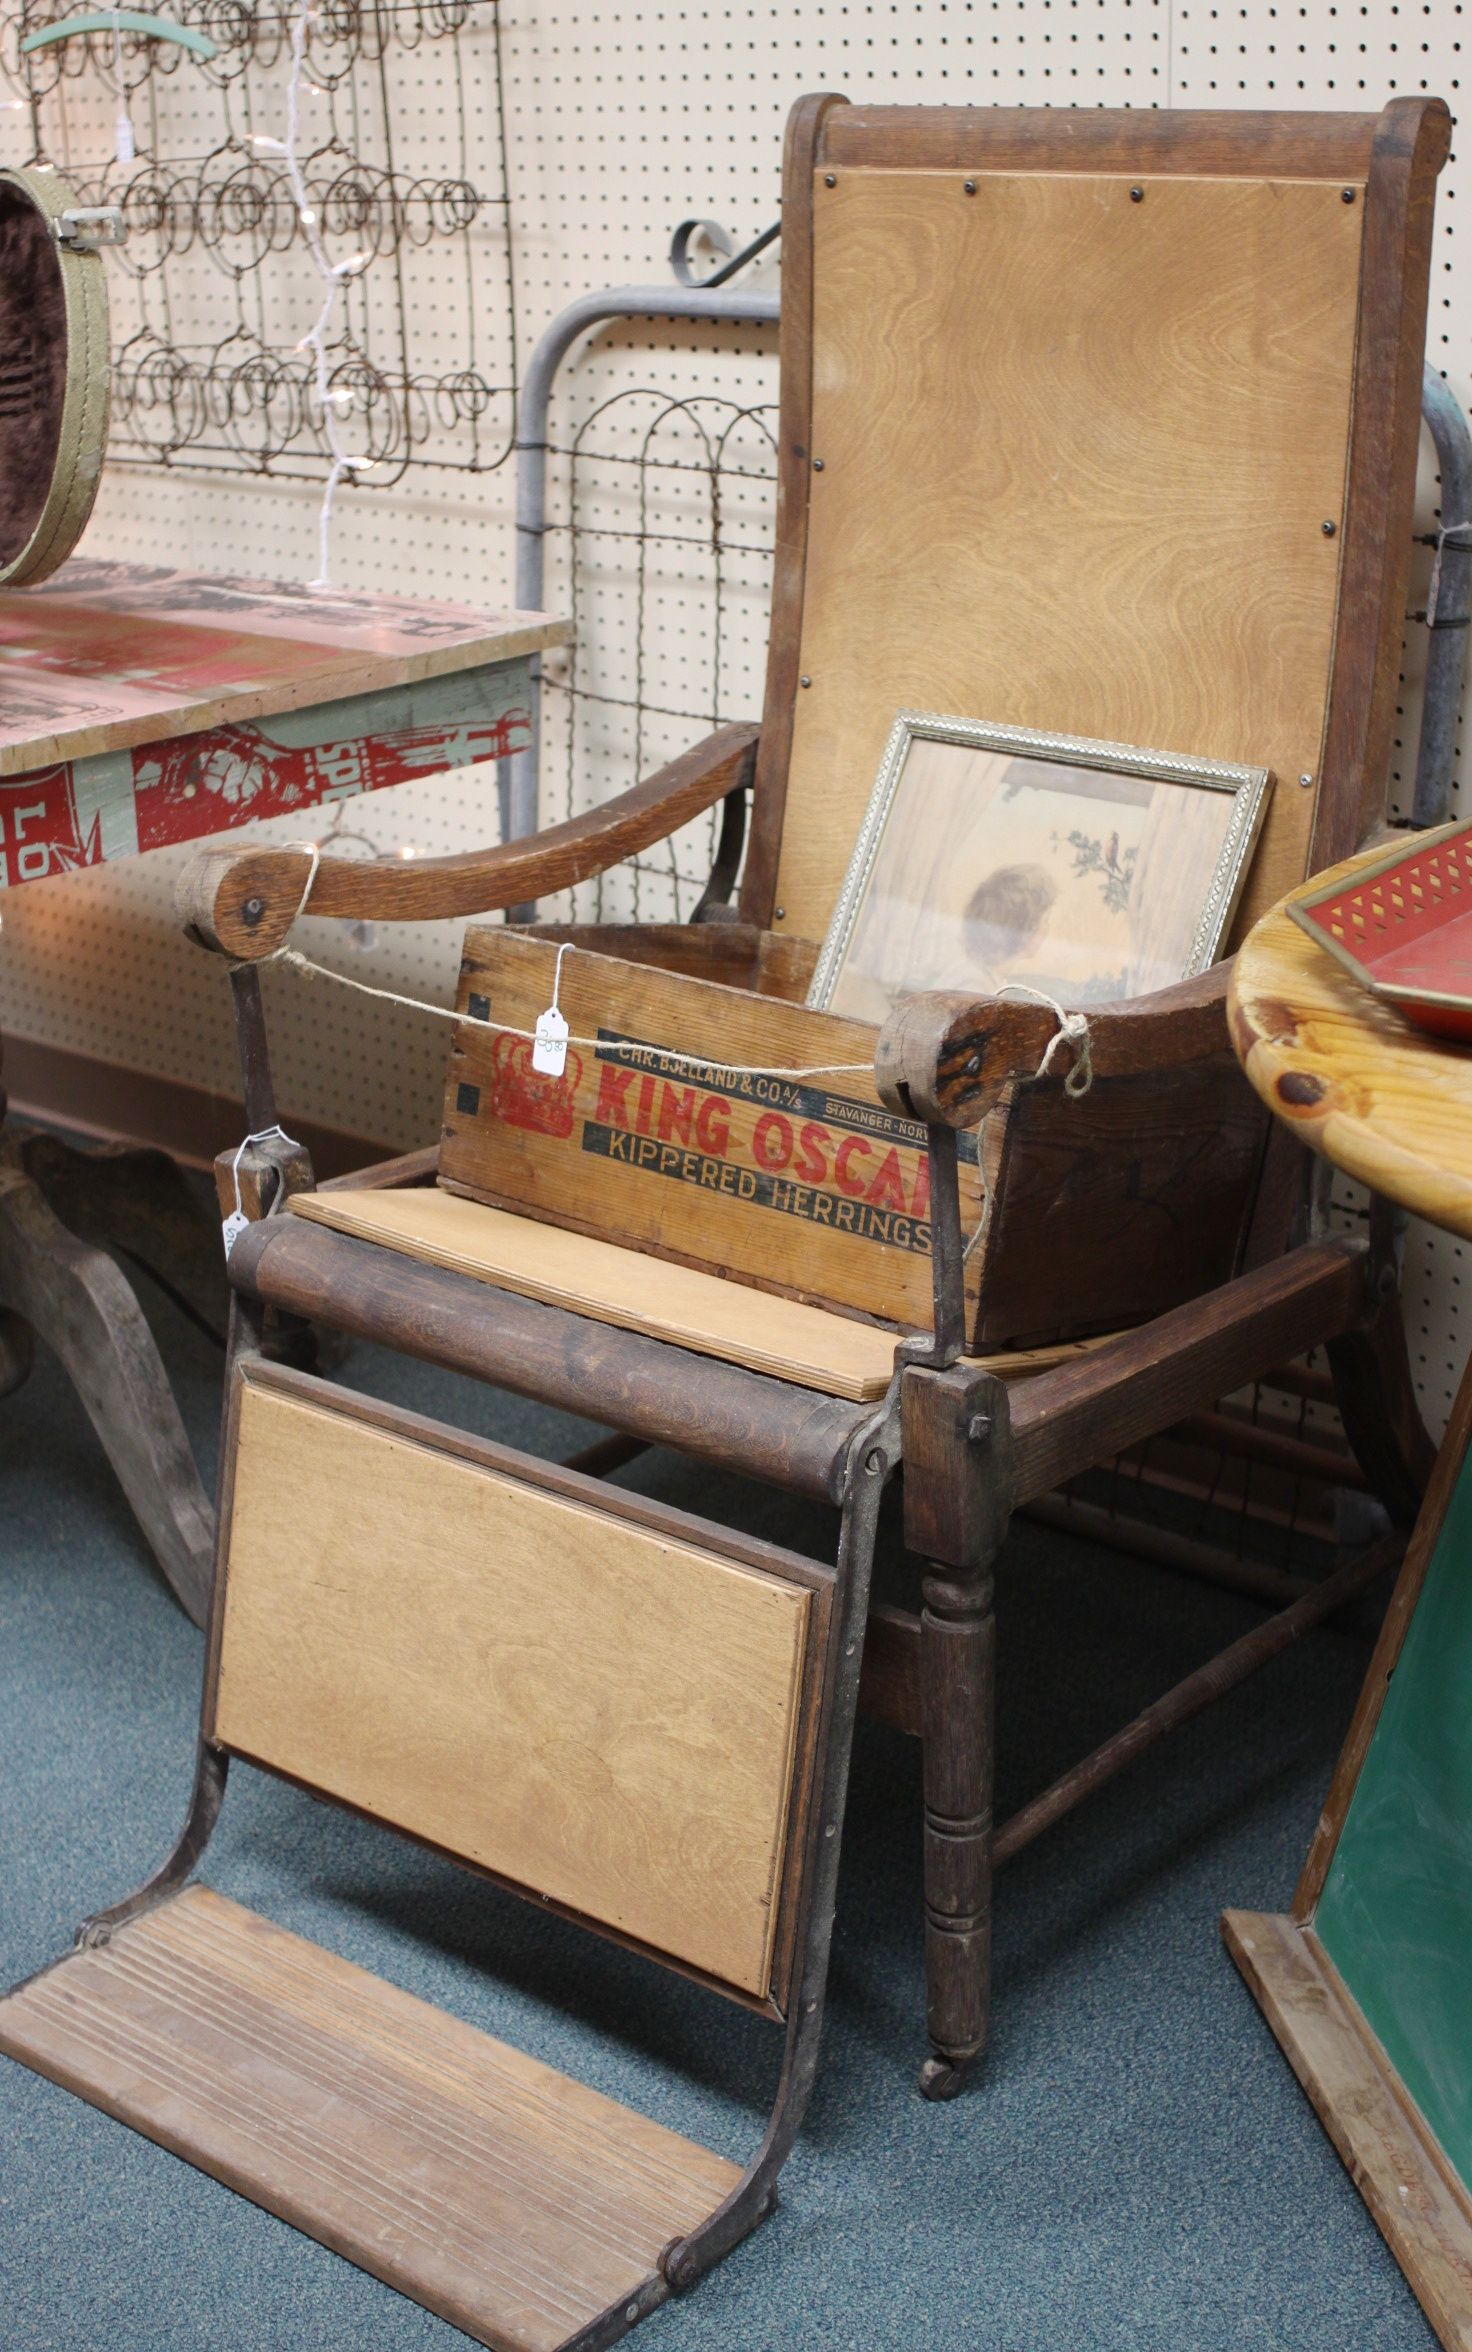 Vintage dental chair at Homestead Handcrafts in San Antonio, Texas. - Vintage Dental Chair At Homestead Handcrafts In San Antonio, Texas